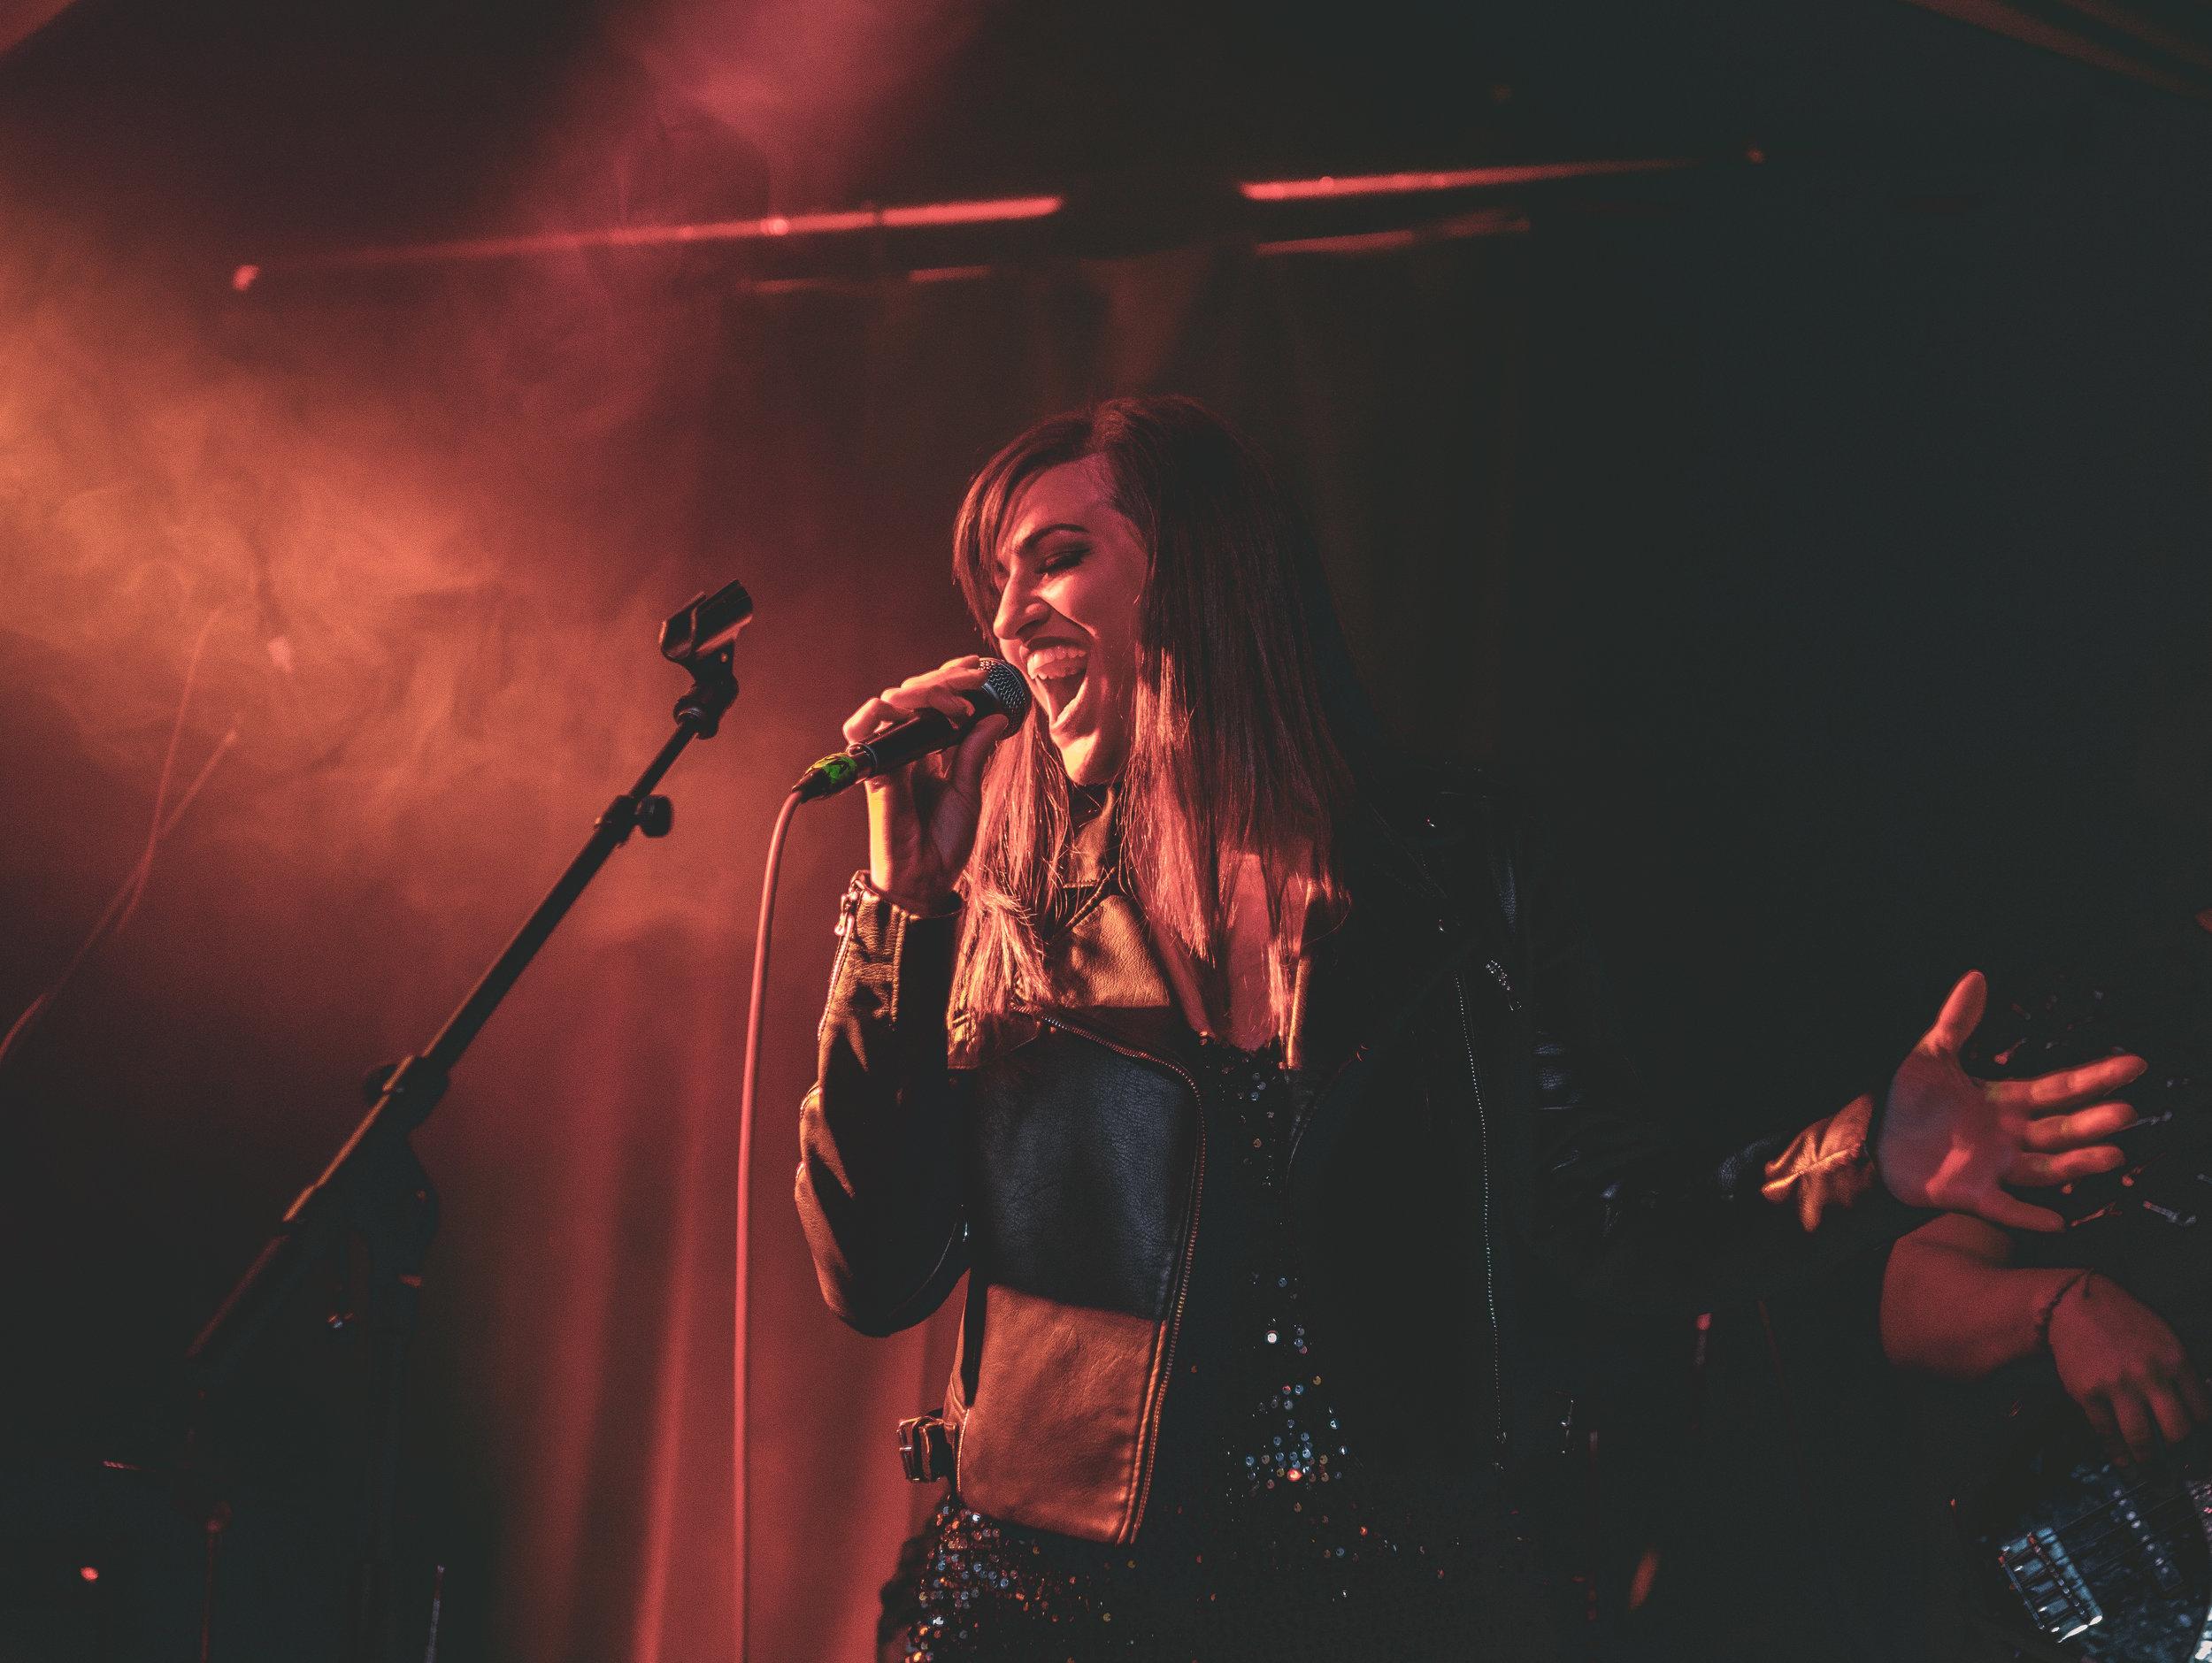 CONCERT, LIVE SHOWS - Photos of a Dublin Live Band Karaoke night called Rockstar KaraokeSee More